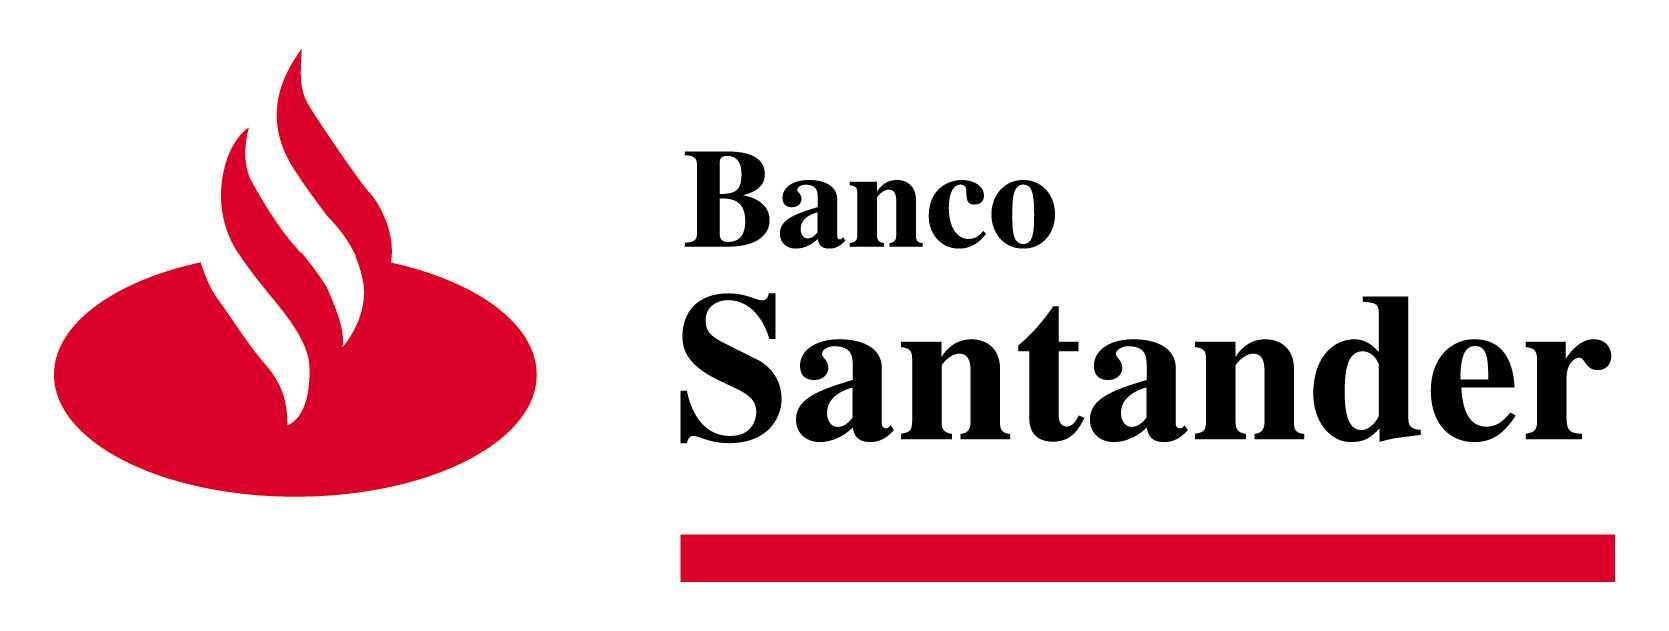 Banco Santander Uruguay Chooses Cryptomathic And Icpayment